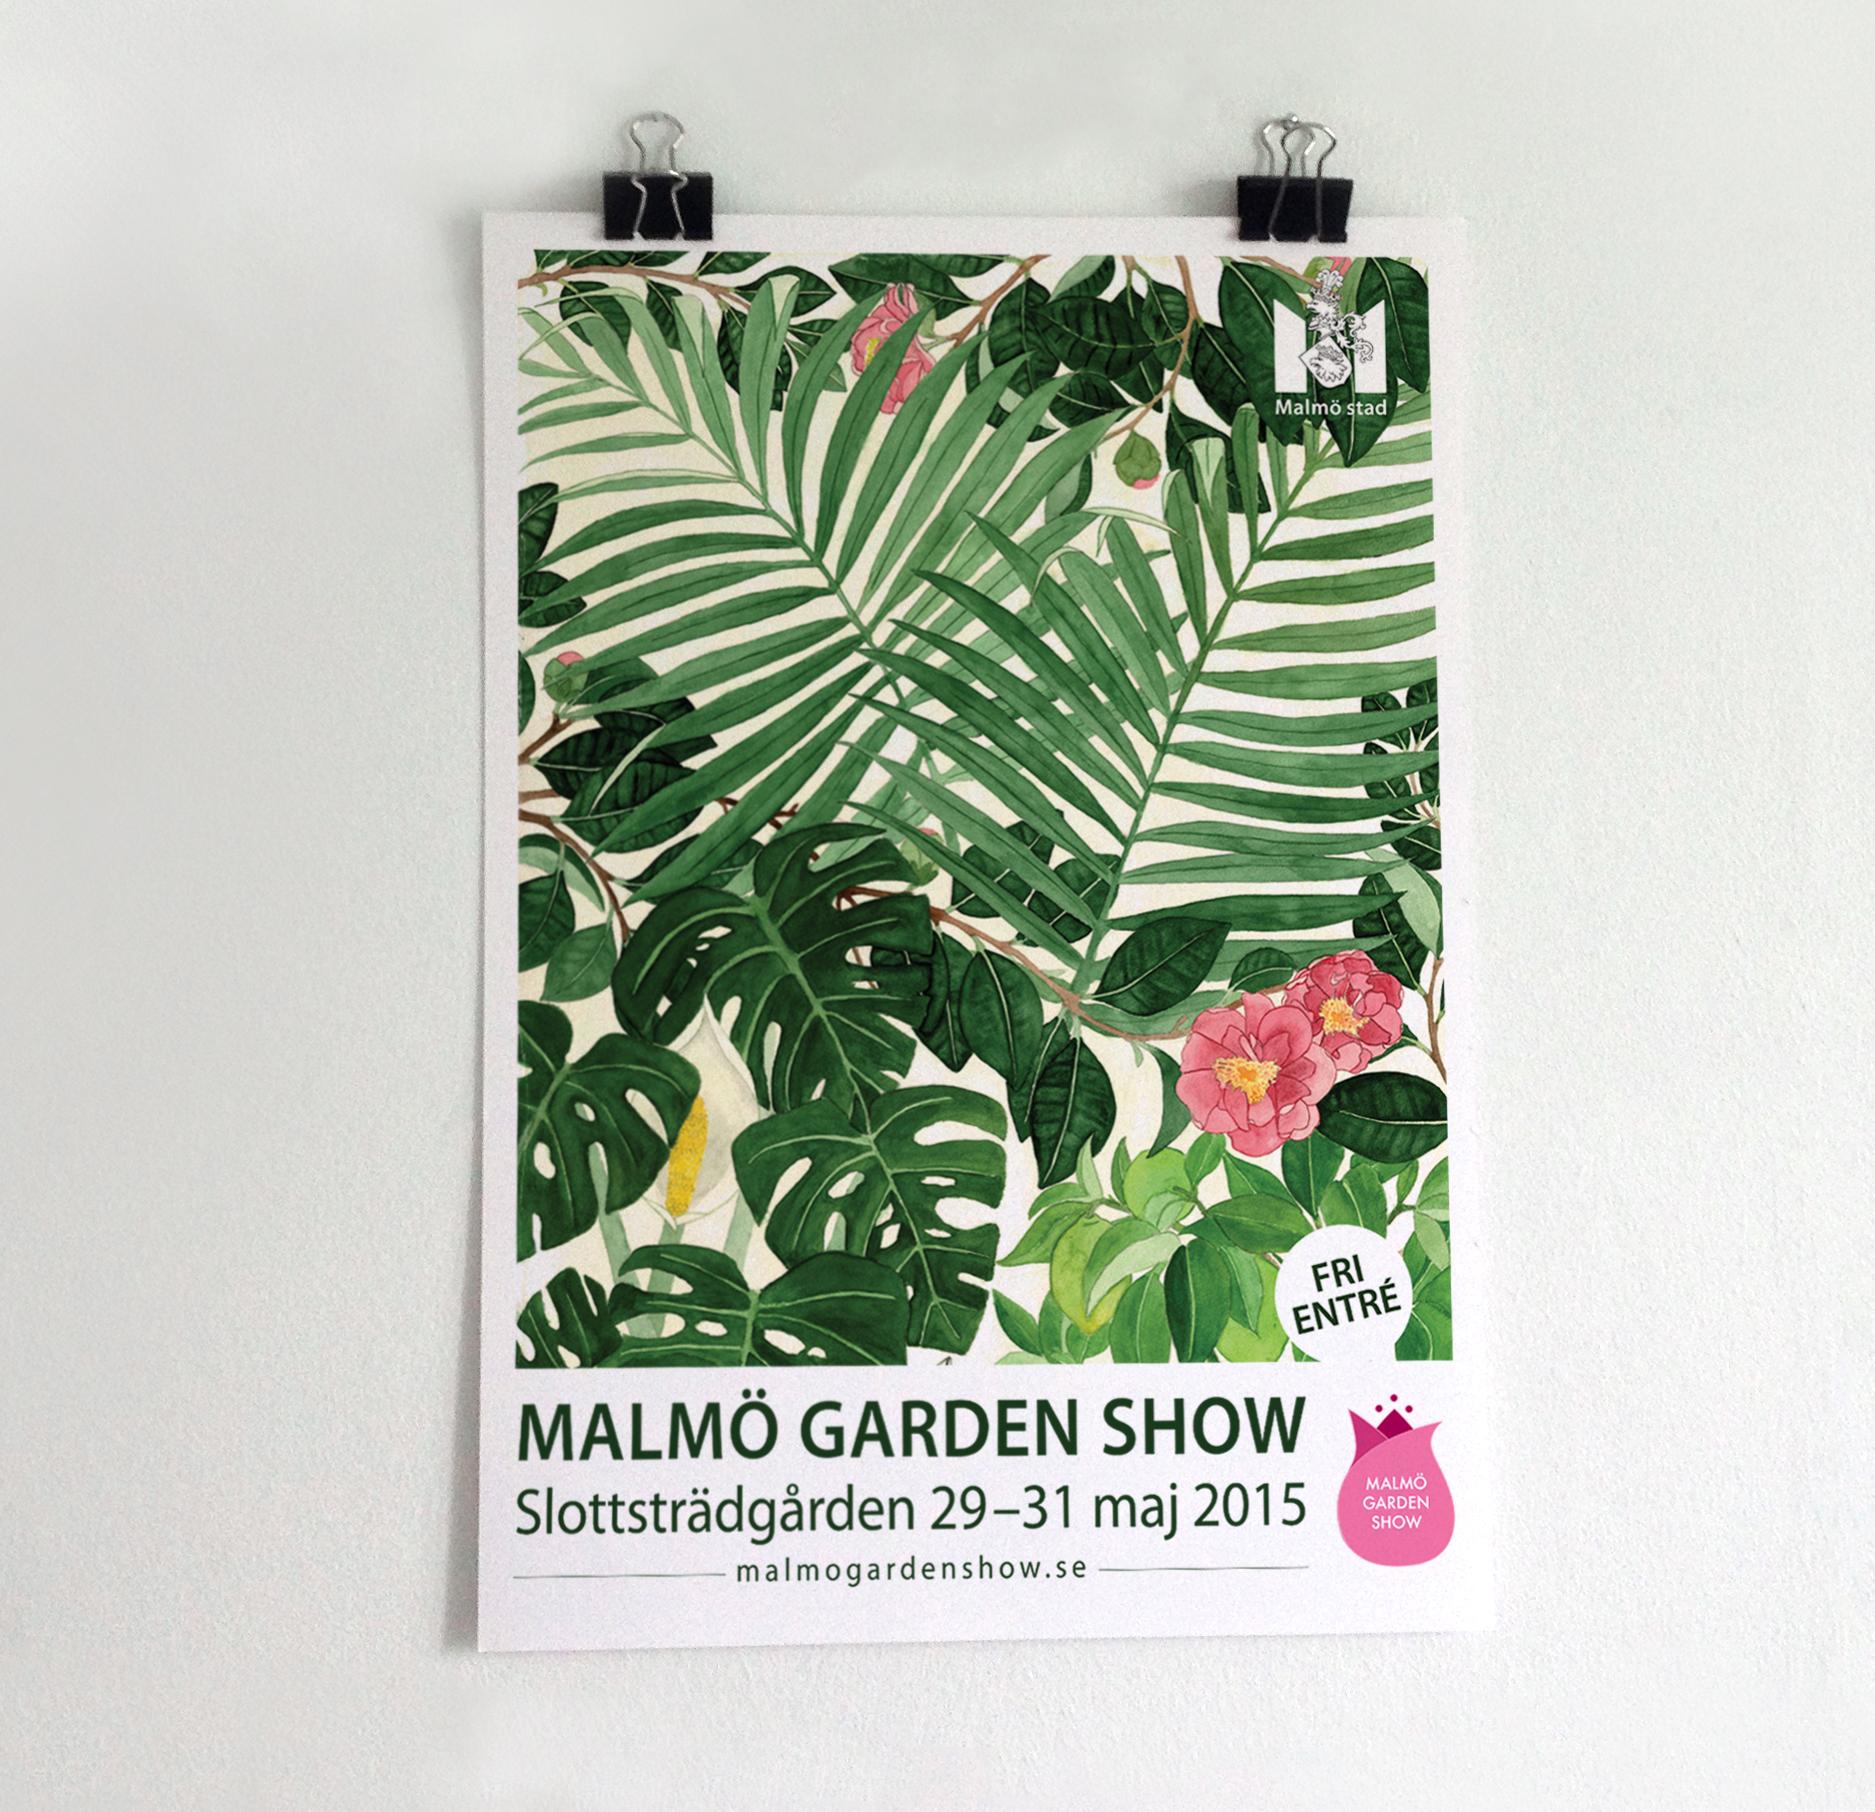 Malmö Garde Show 2015